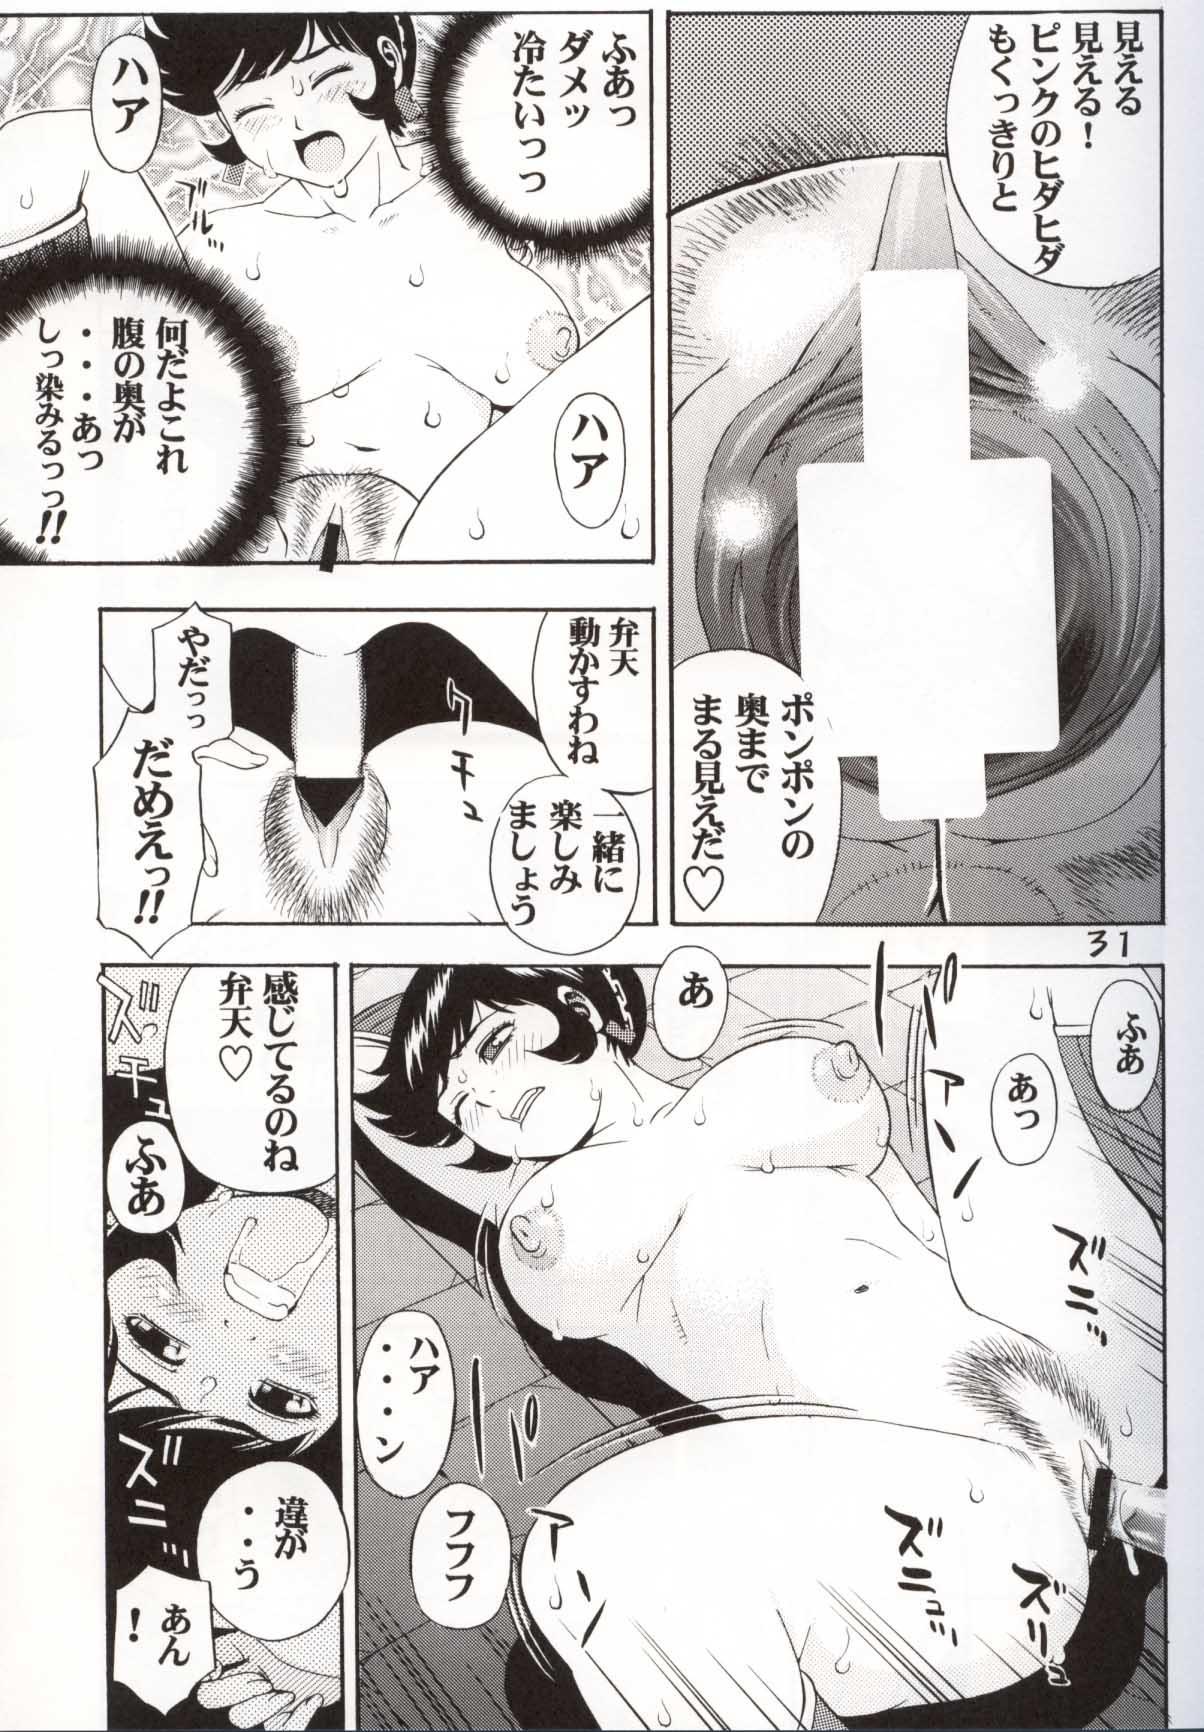 GIRL POWER Vol.10 29